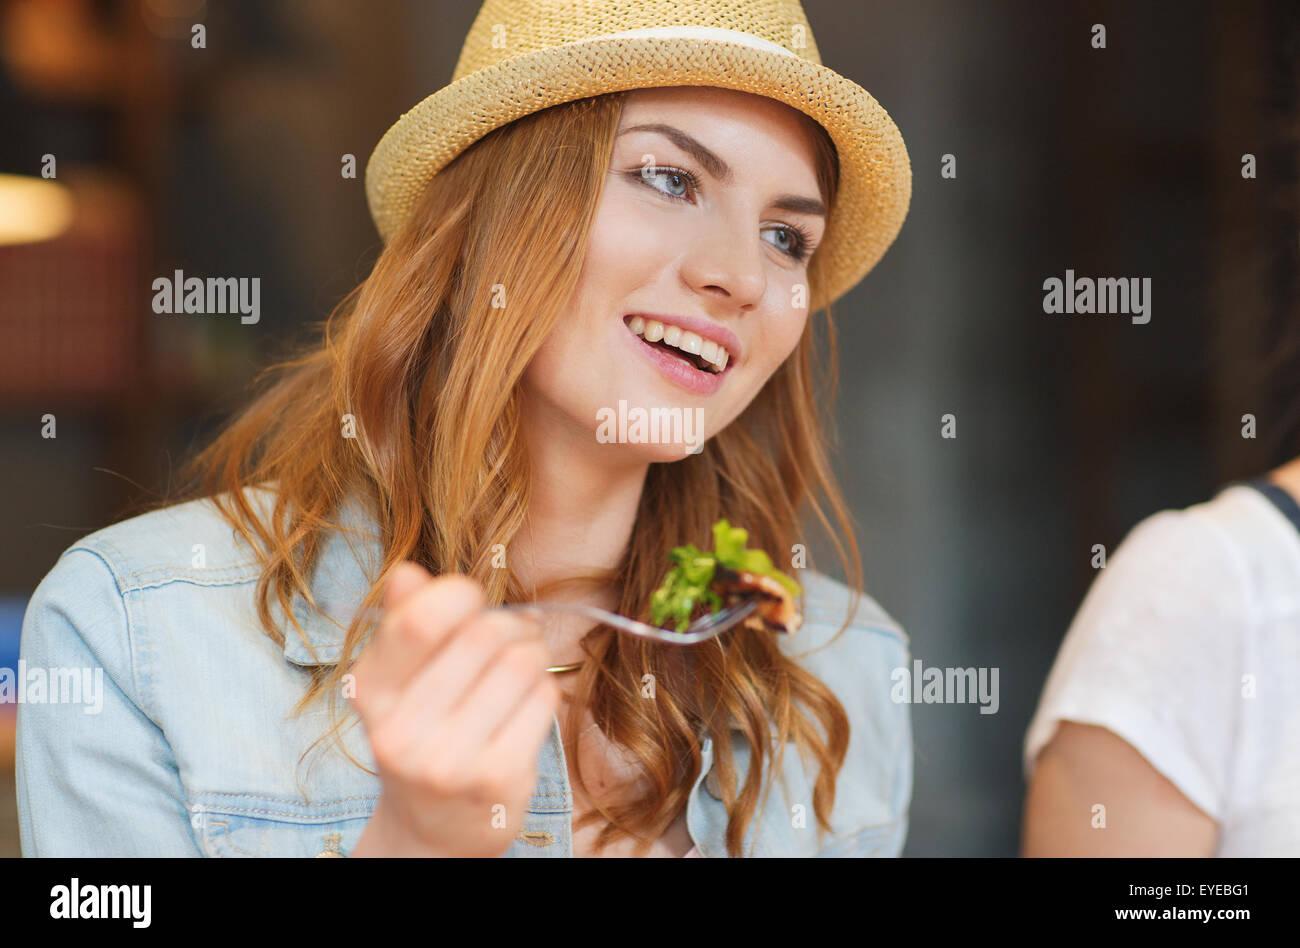 happy young woman eating salad at bar or pub - Stock Image